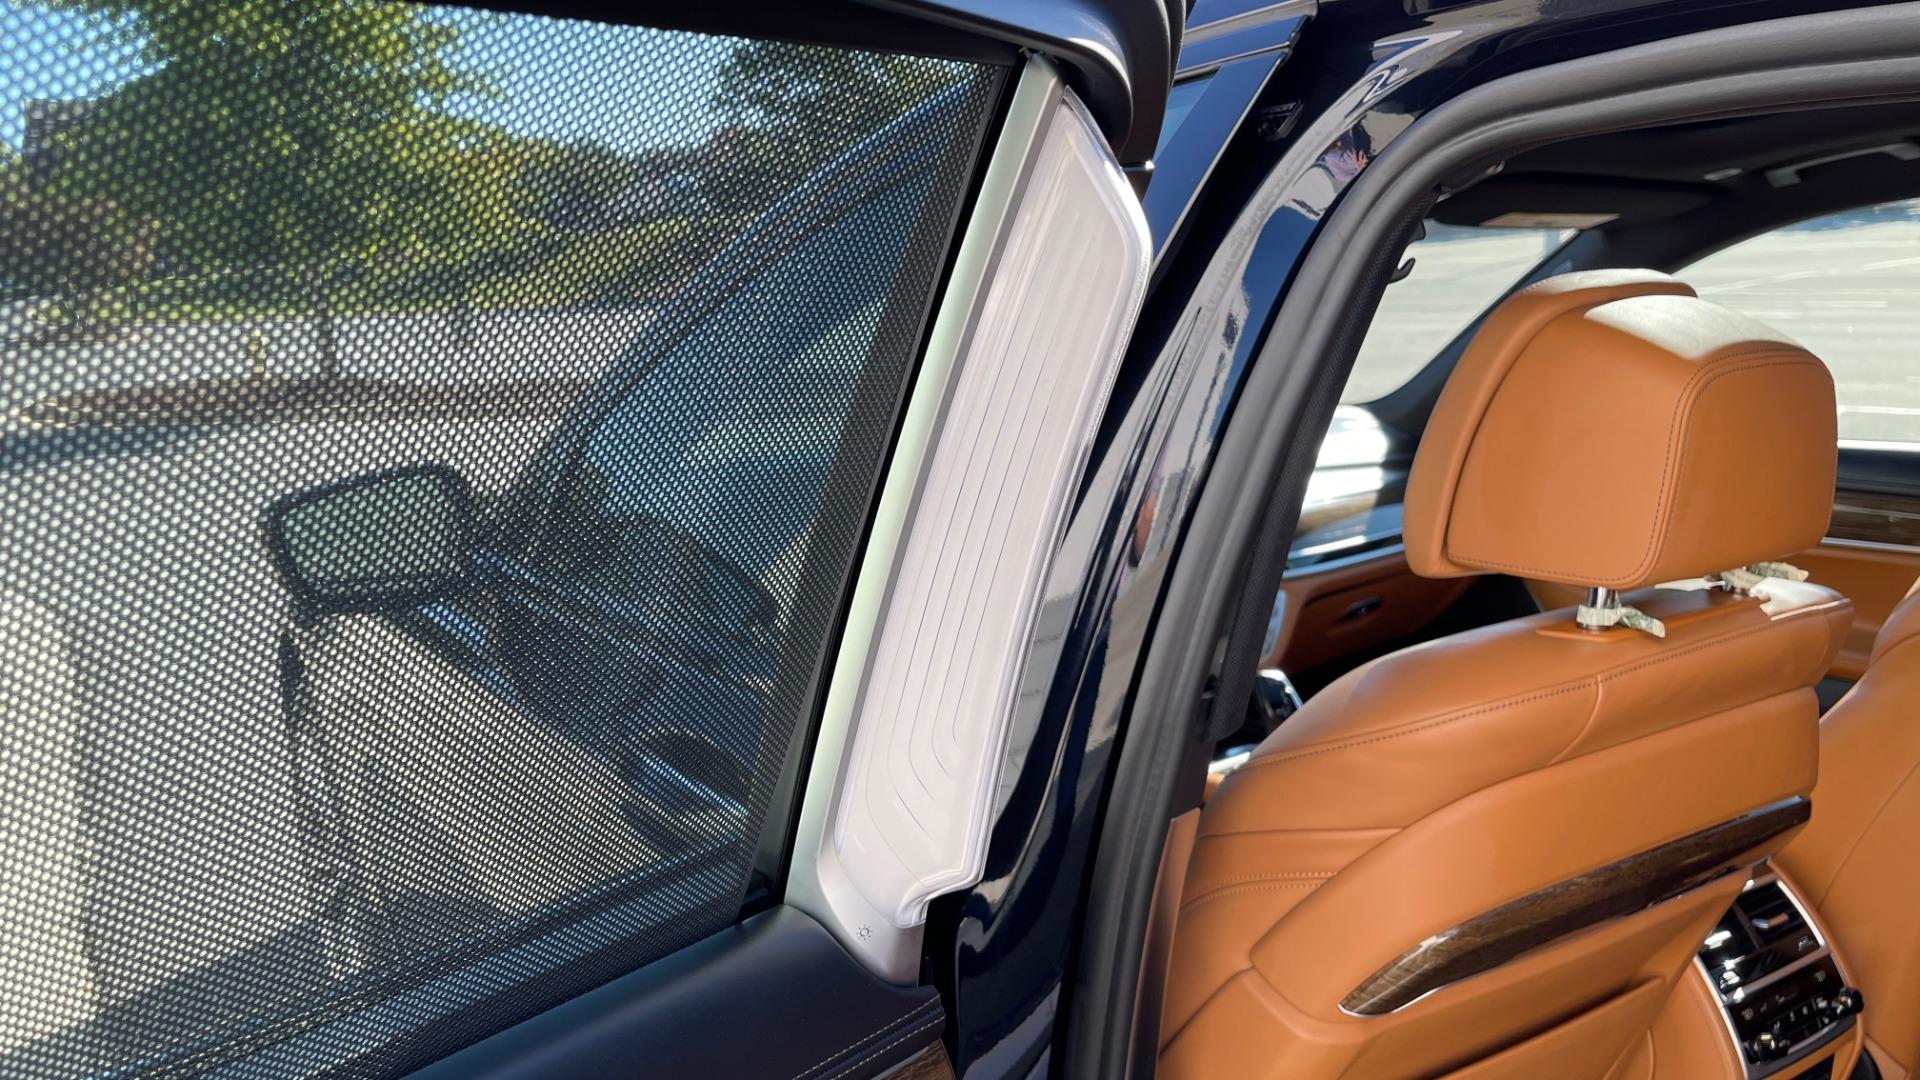 Used 2019 BMW 7 SERIES 750I XDRIVE M-SPORT / EXEC PKG / DRVR ASST PLUS / CLD WTHR / PAR for sale $60,995 at Formula Imports in Charlotte NC 28227 44